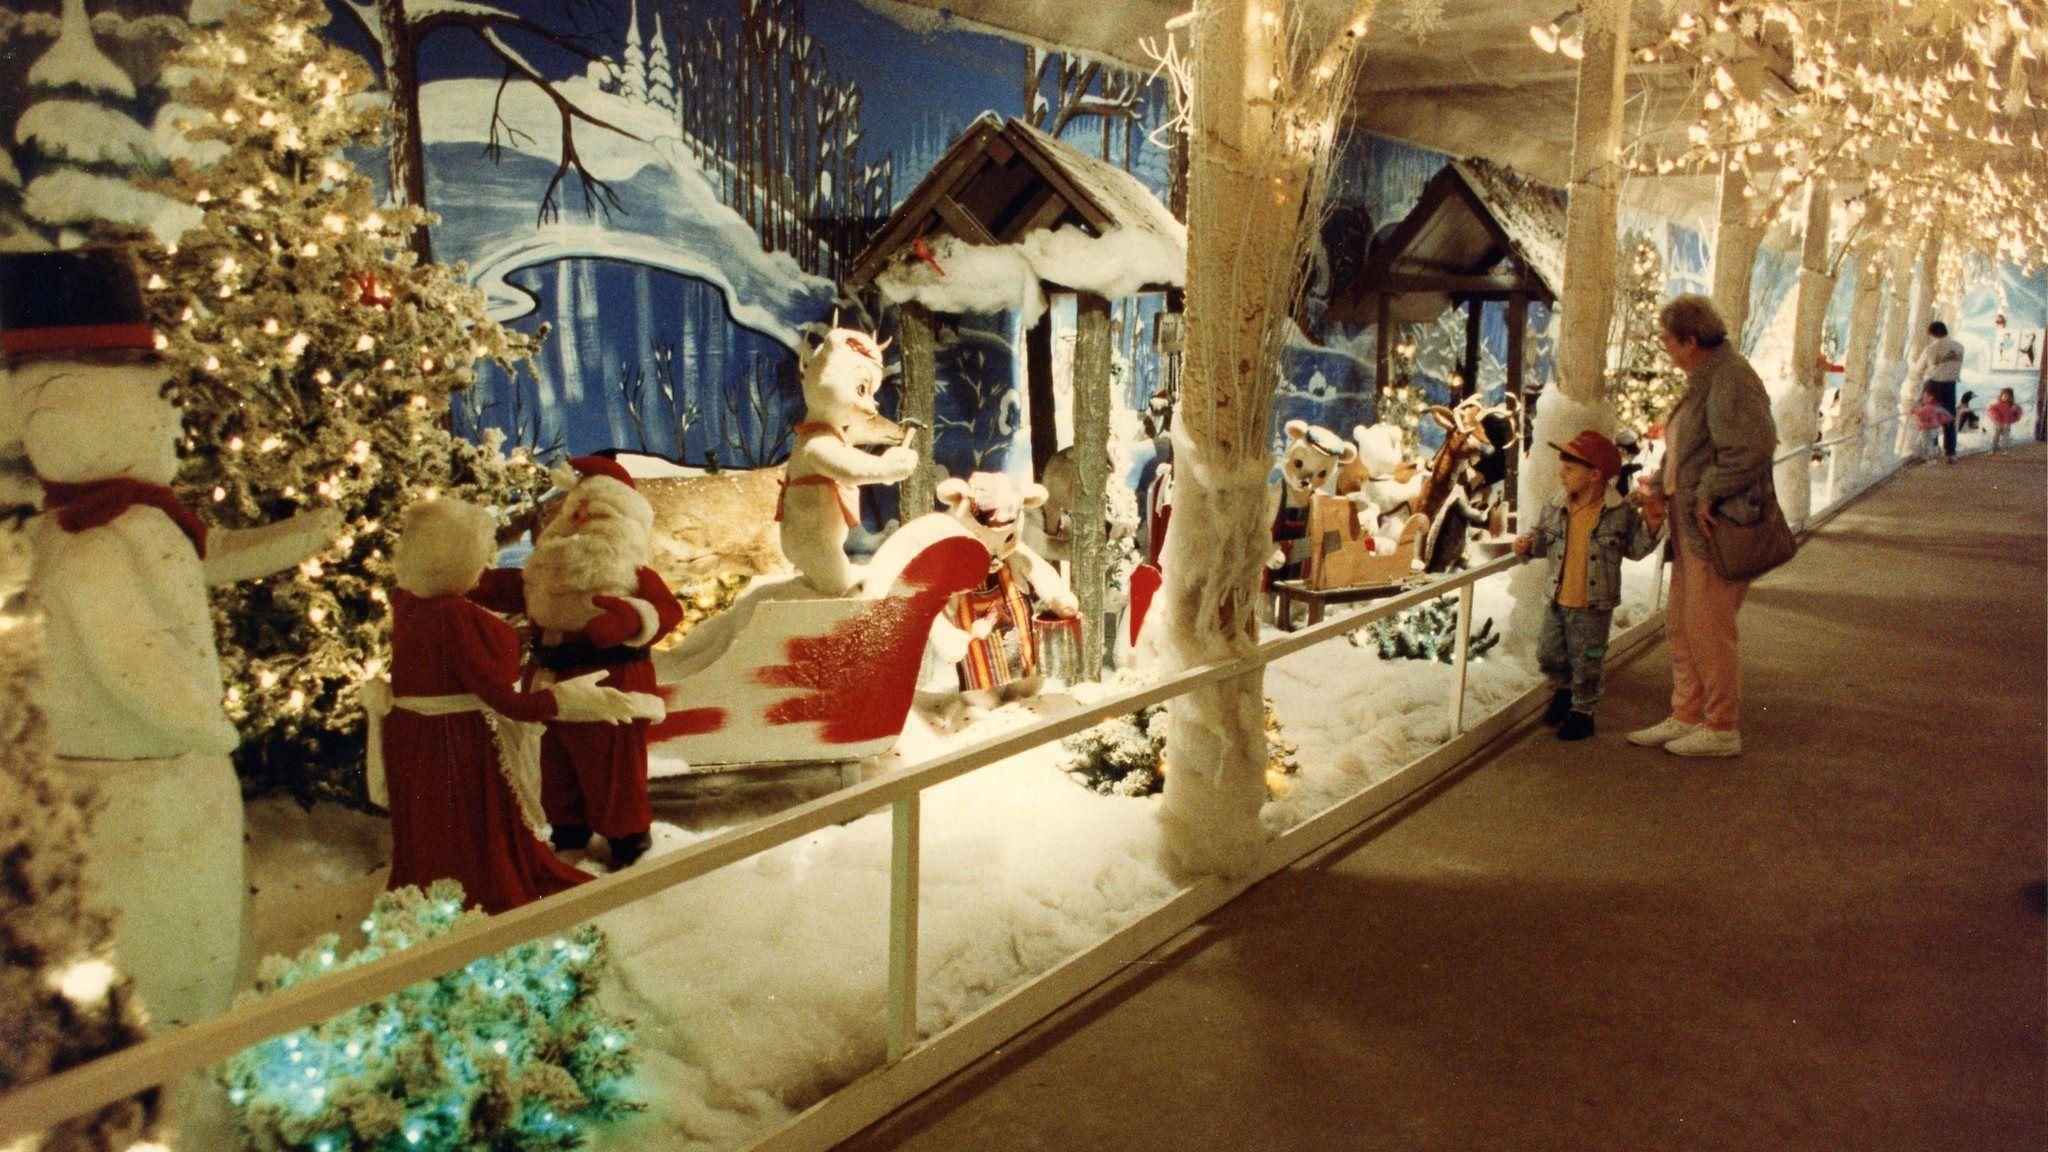 Colemans Nursery Christmas Display 2020 Pin by diane sandage on portsmouth Virginia | Christmas wonderland